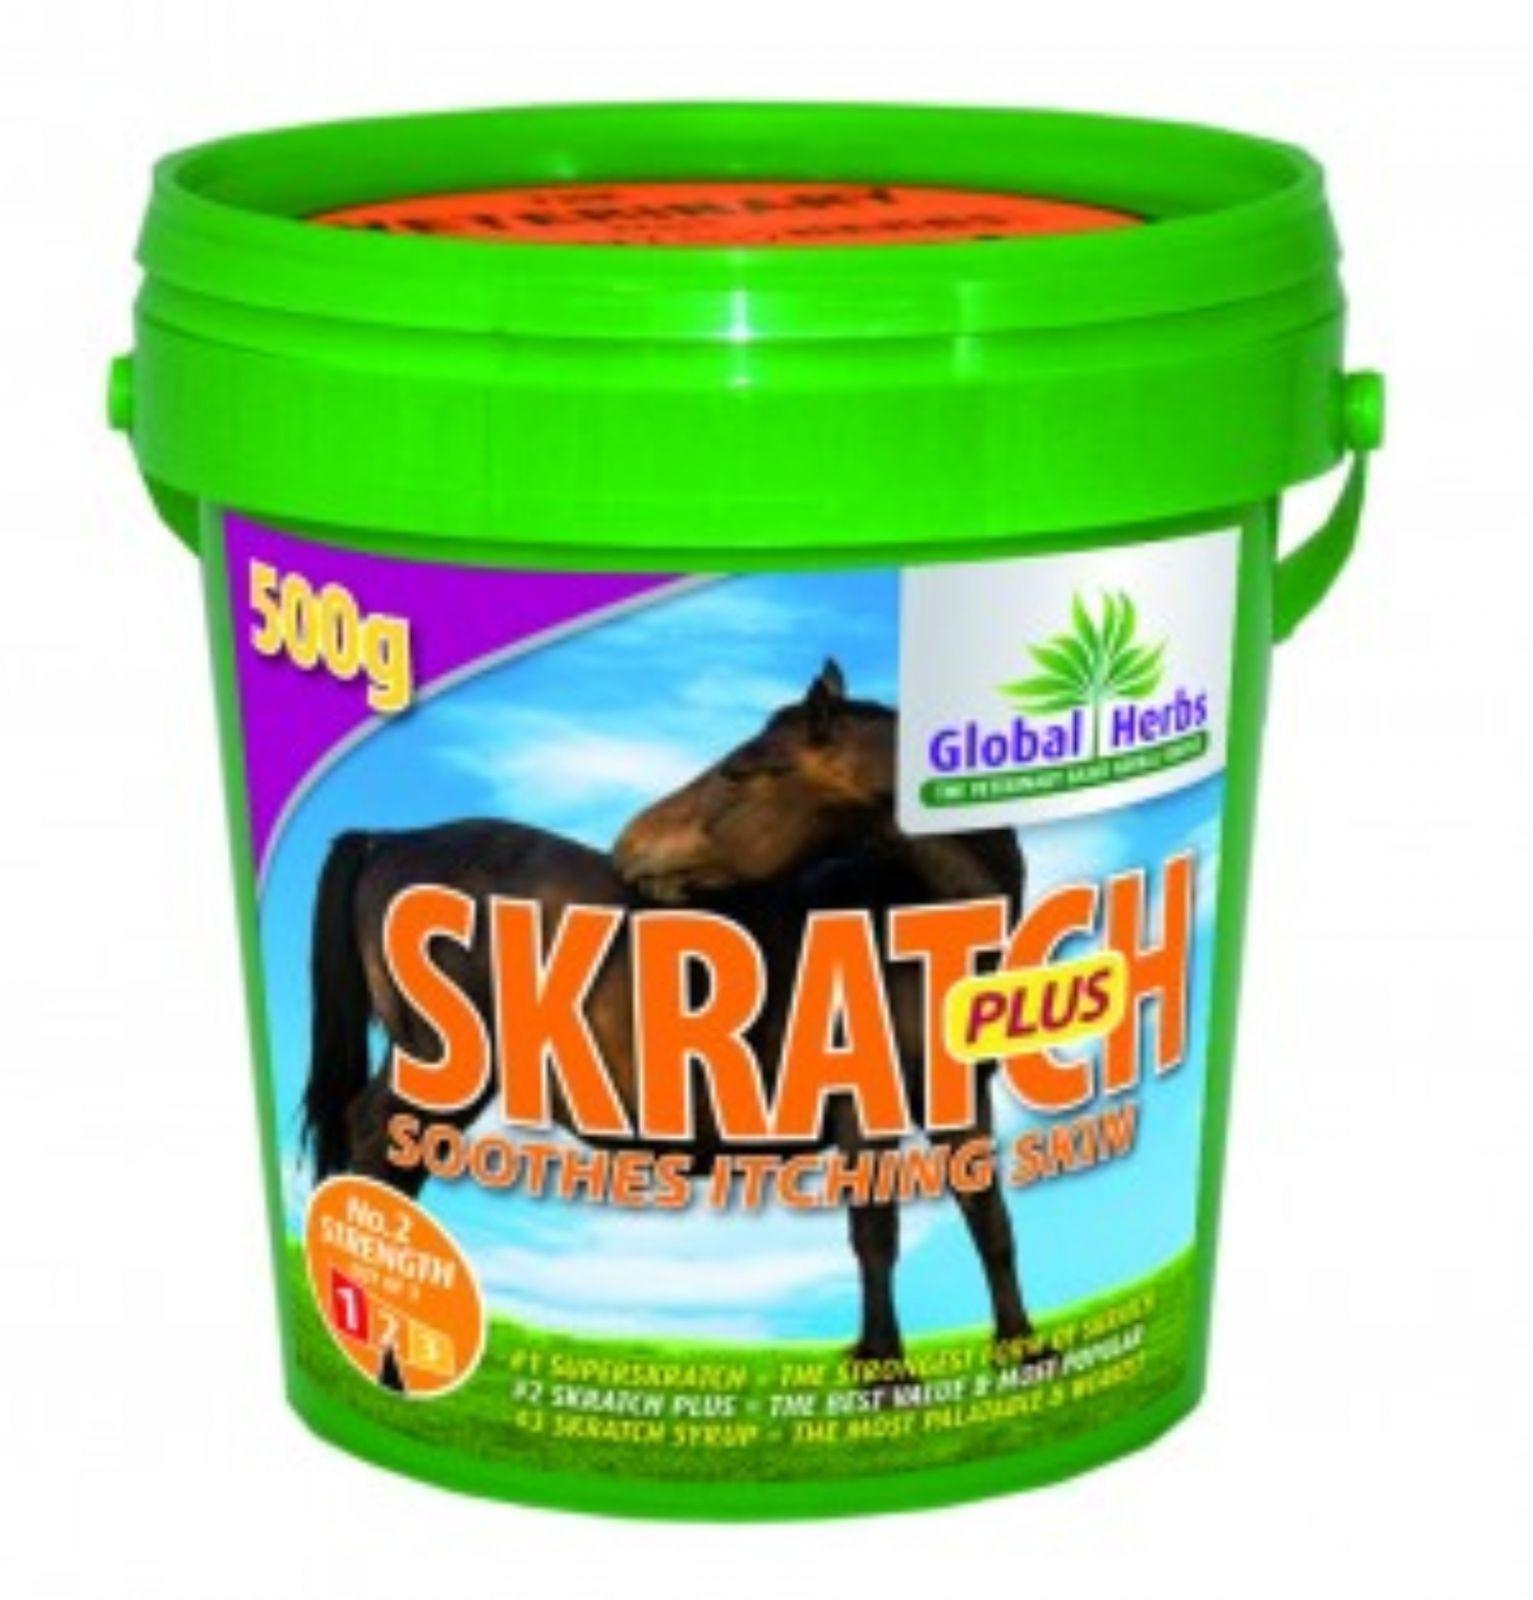 Global Herbs Scratch Plus 500G